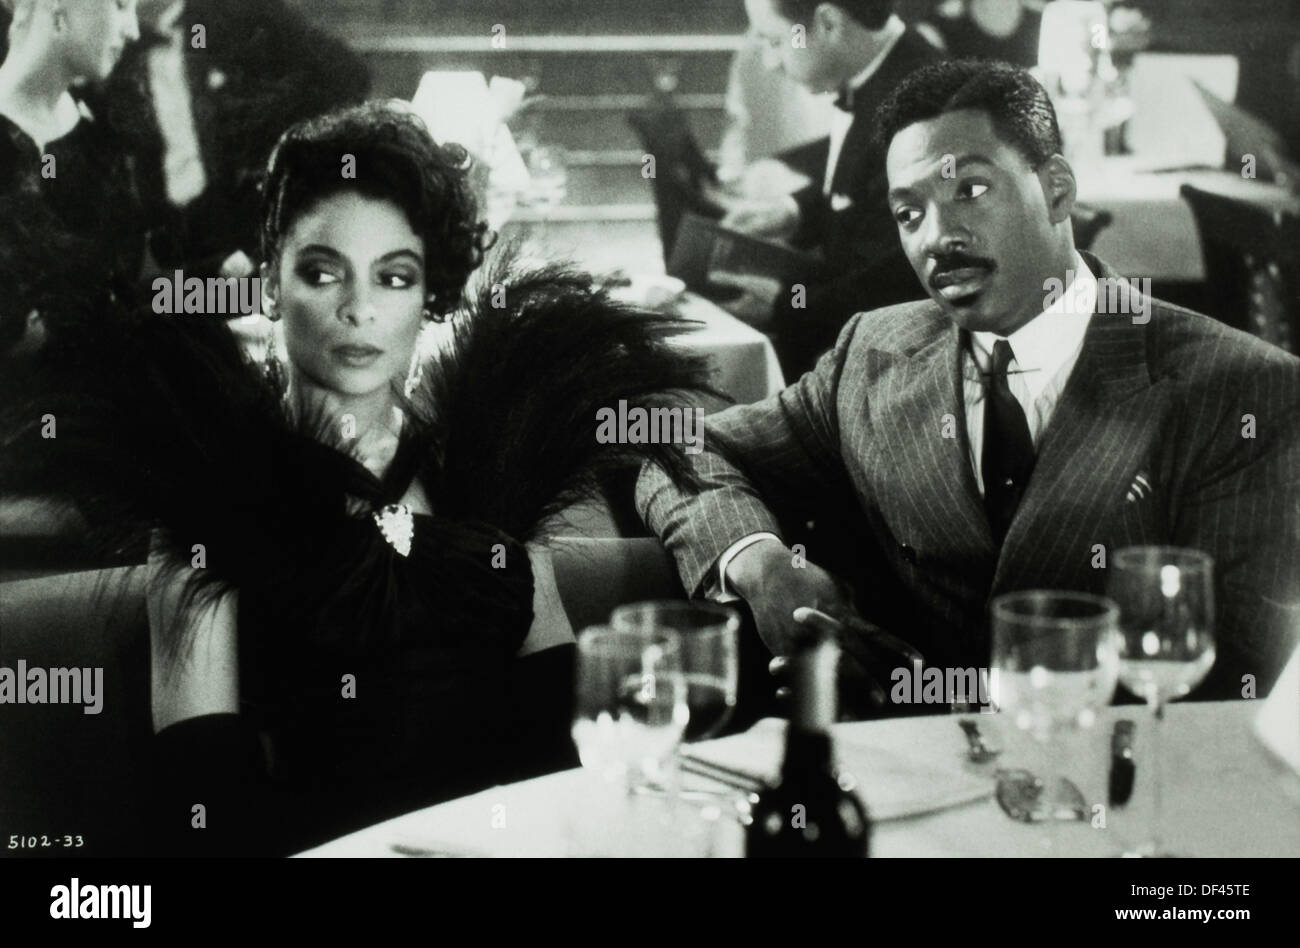 Eddie Murphy and Jasmine Guy, On-Set of the Film, 'Harlem Nights', 1989 - Stock Image